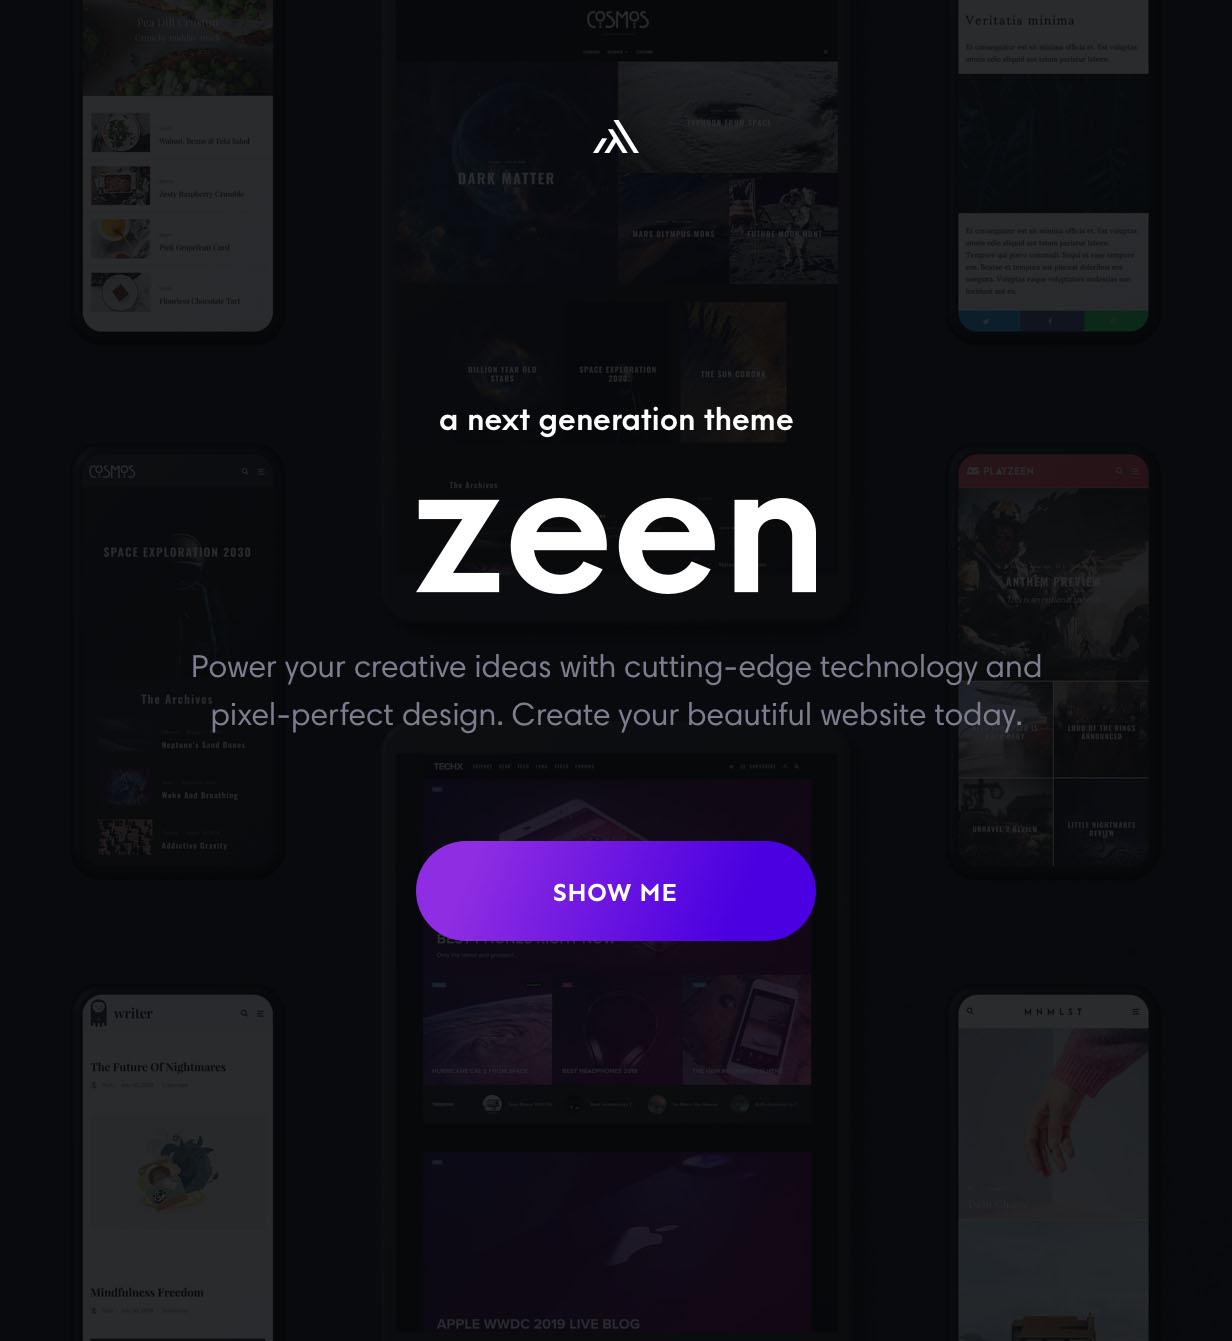 zeen magazine wordpress theme - Zeen | Next Generation Magazine WordPress Theme